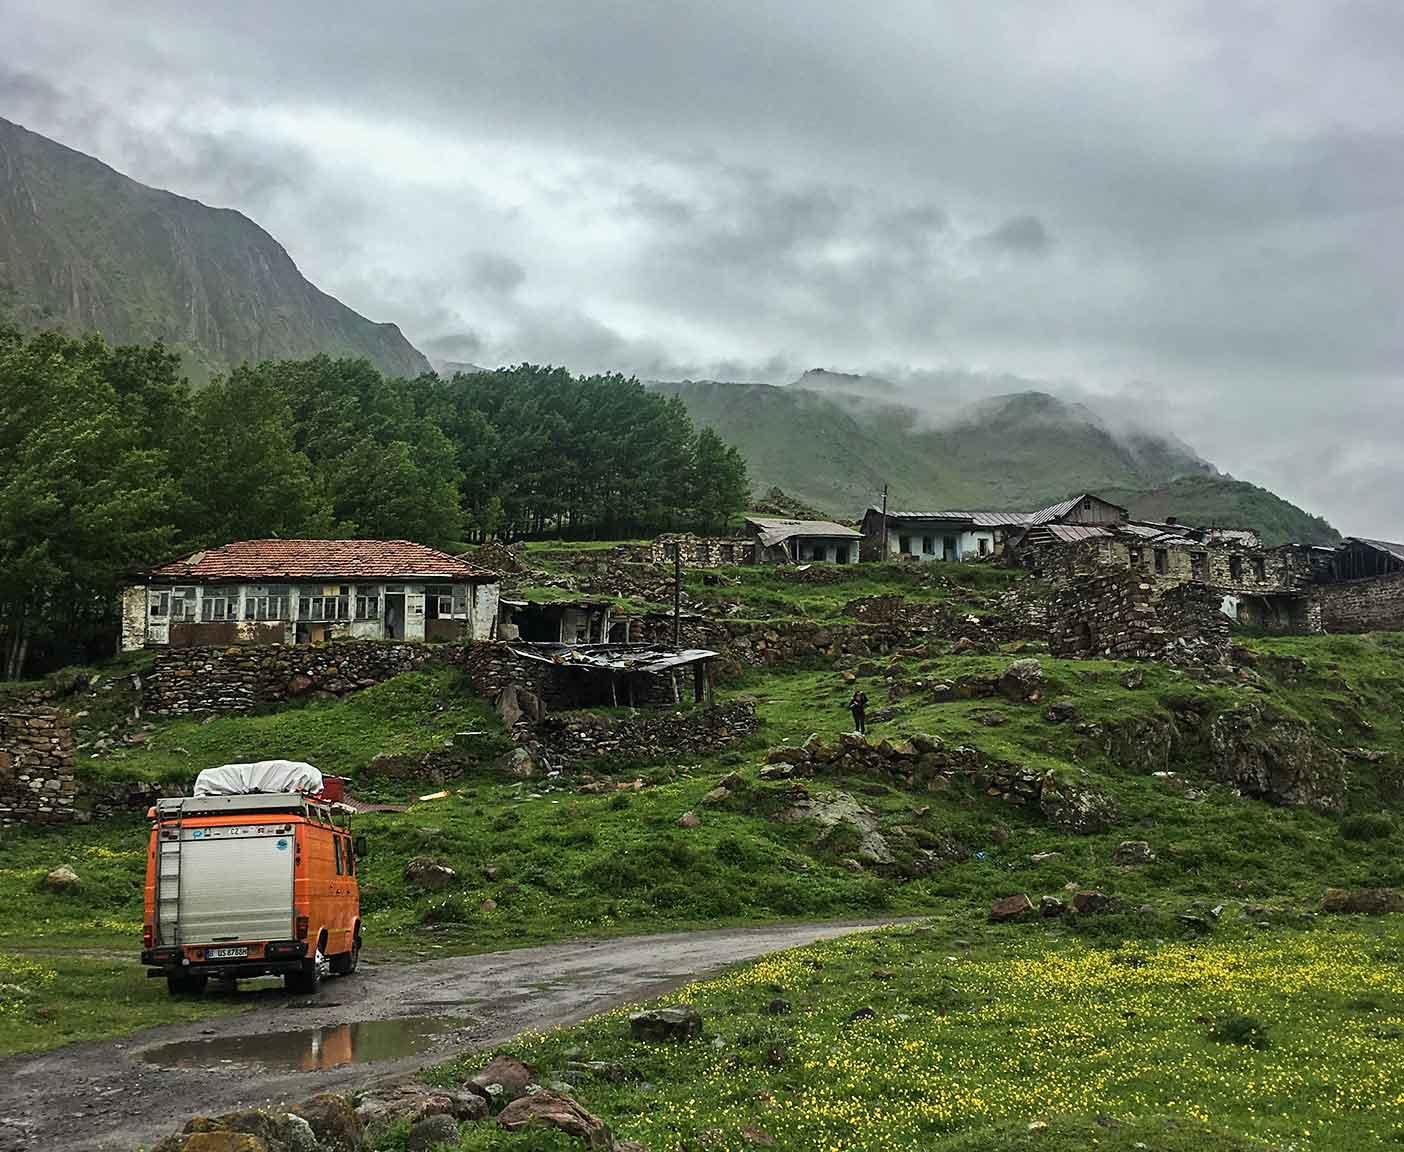 georgien-wohnmobil-erfahrungsbericht-camping-urlaub-preisniveau-tiflis-vanlife-suedossetien-konflikt